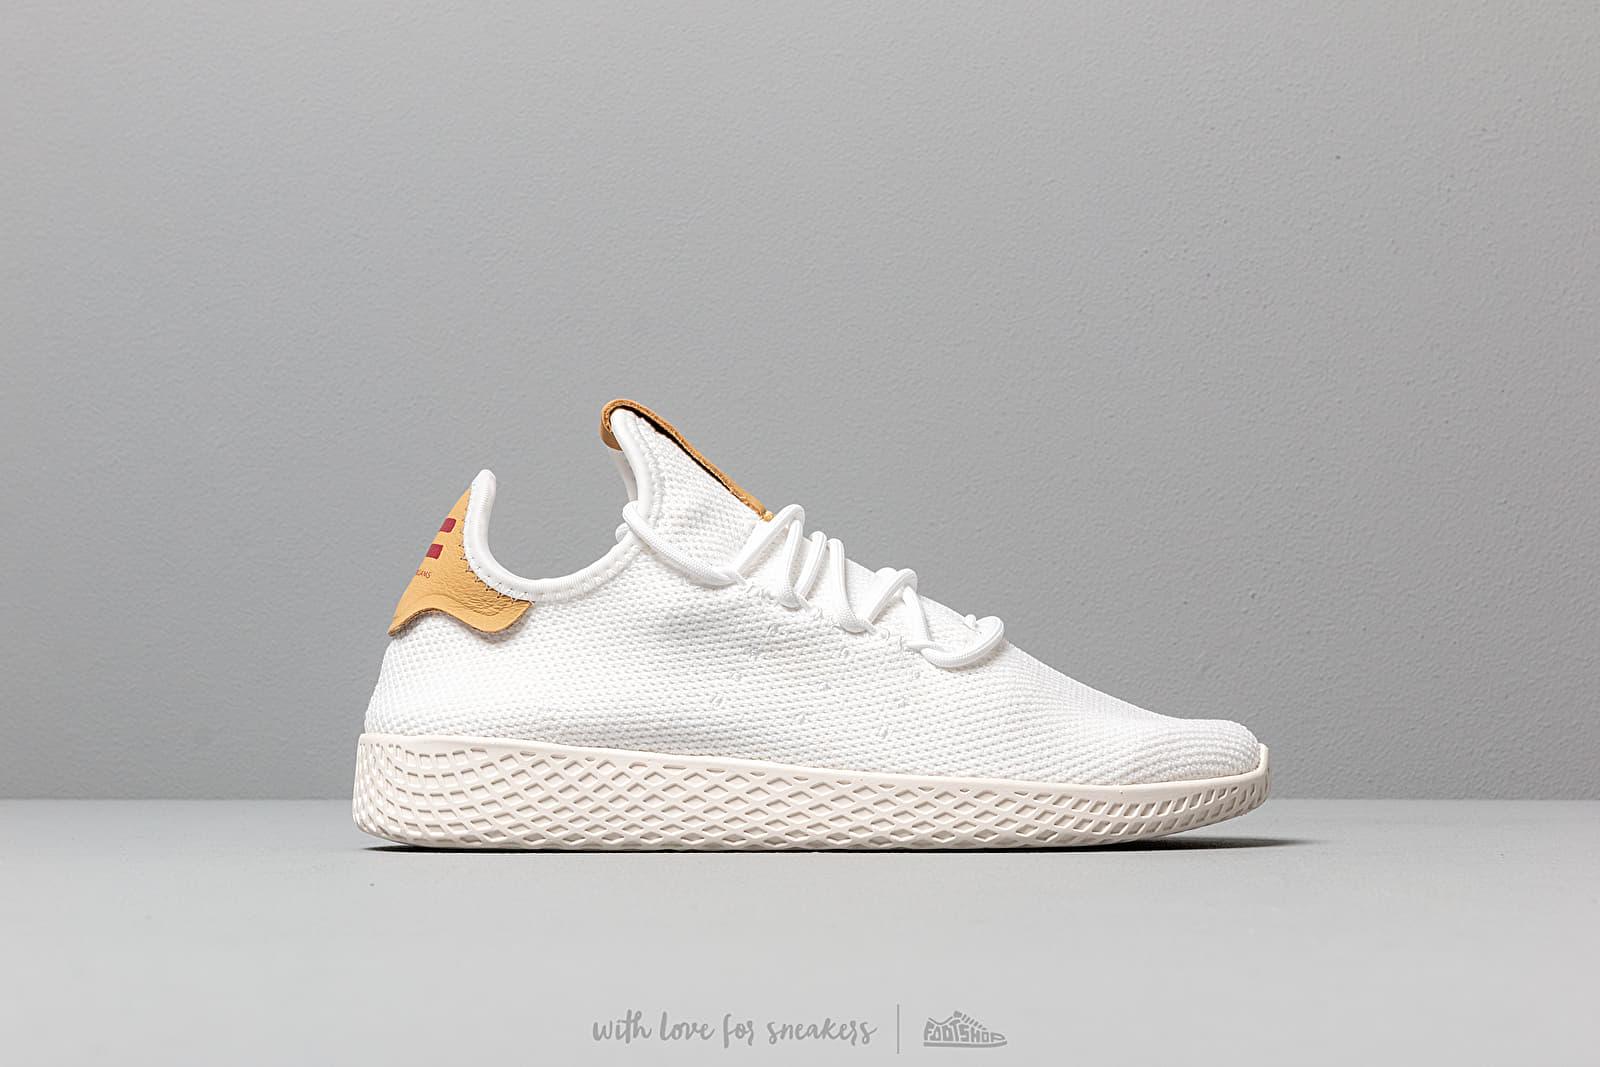 0075fcdb5c6f39 adidas-pw-tennis-hu-w-ftw-white-ftw-white-raw-sand.jpg